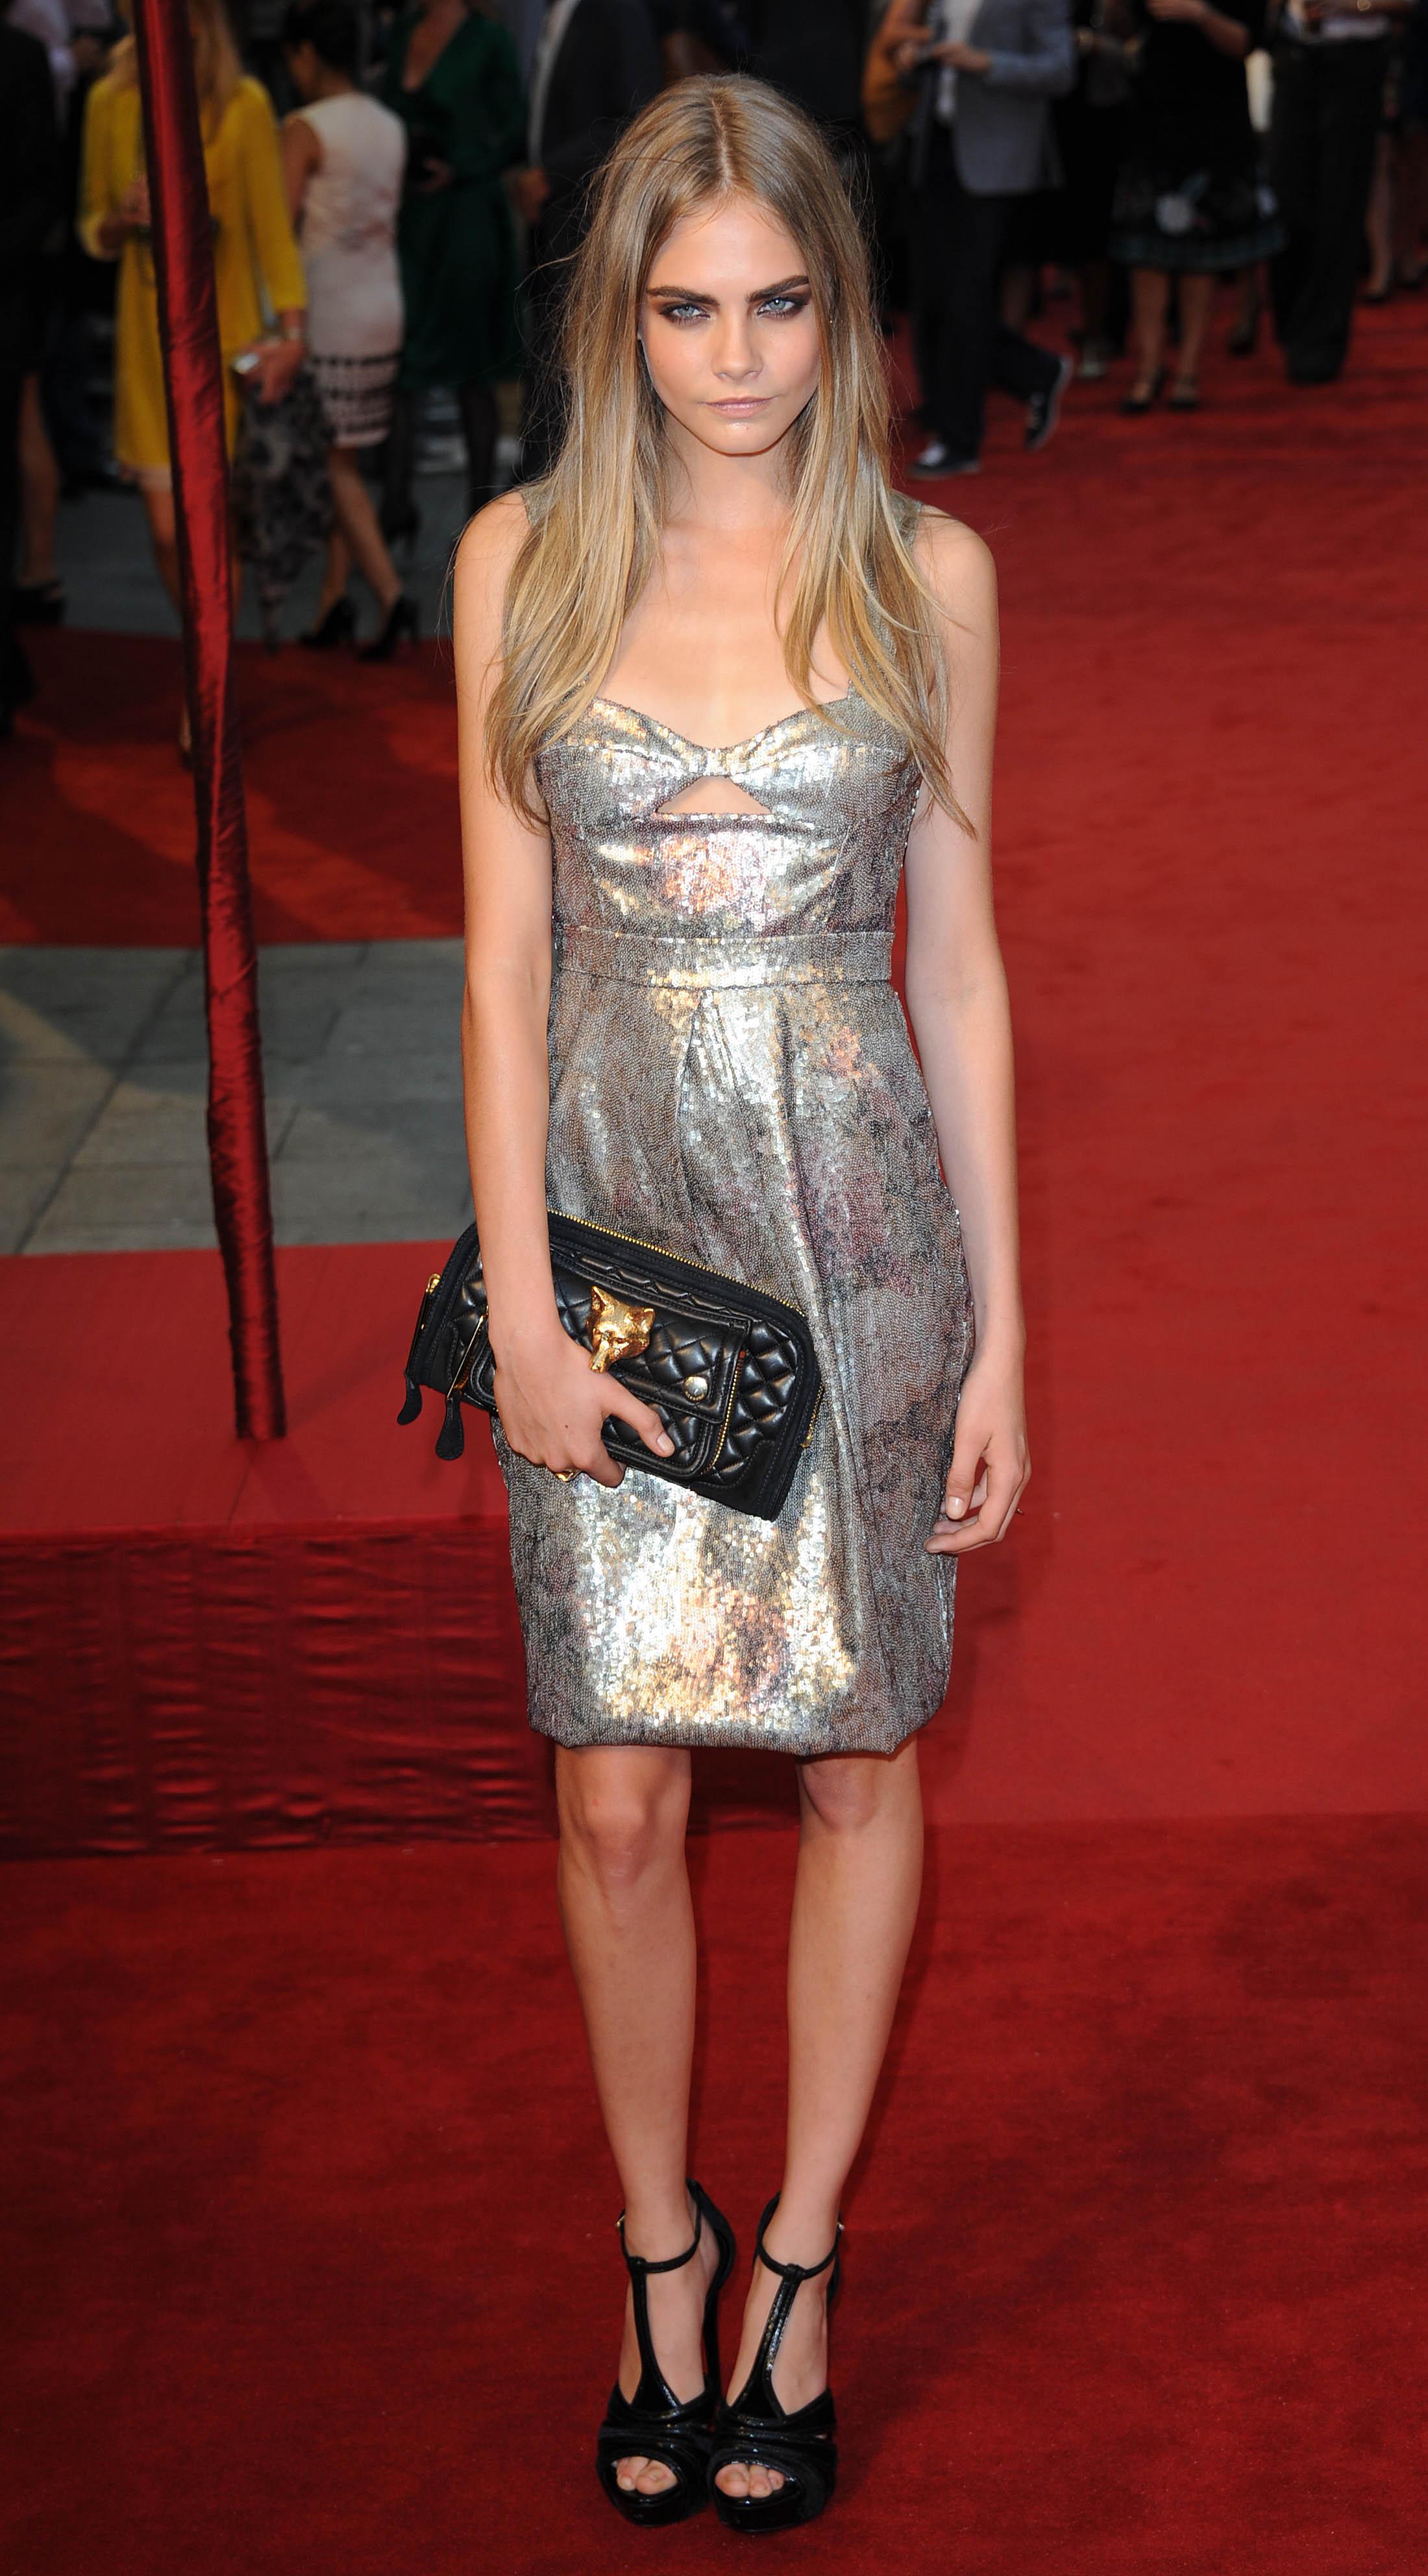 Cara Delevingne attends the UK Premiere of Anna Ka